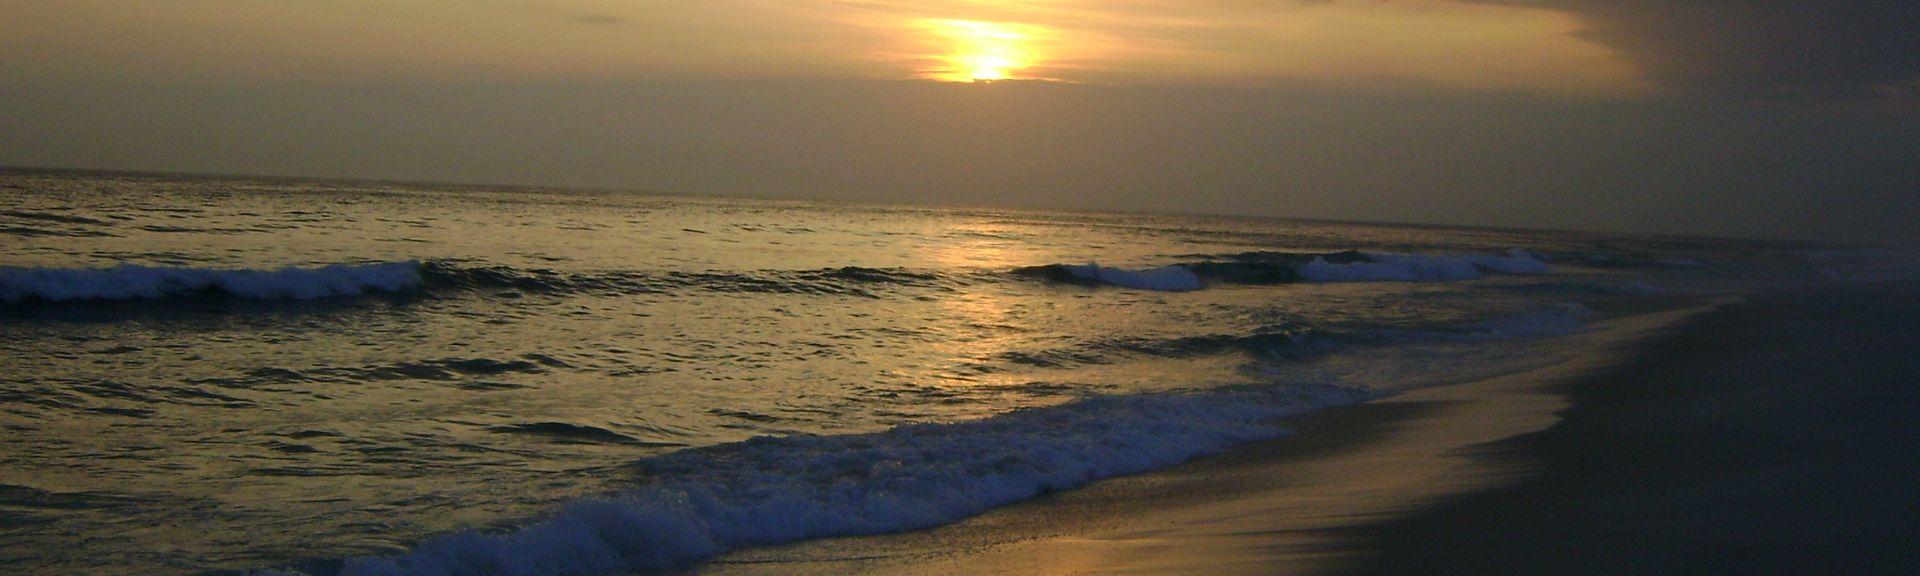 Palmeiras Beach, Cabo Frio, Rio de Janeiro (state), Brazil